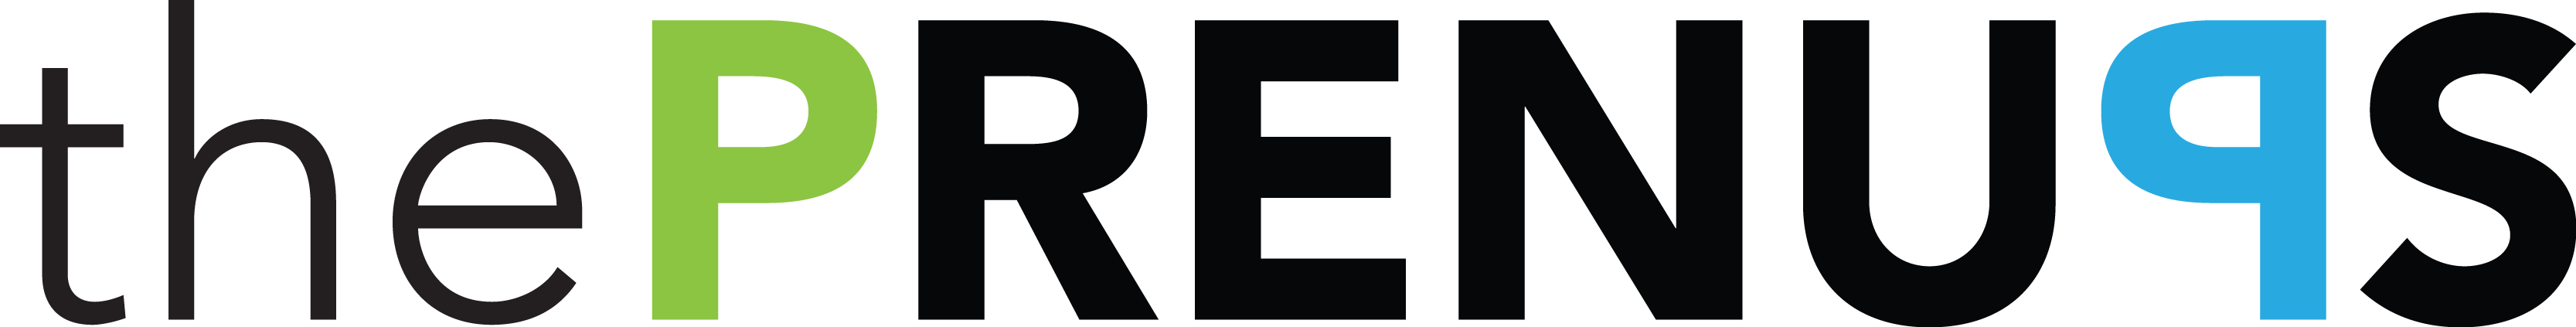 hdwk logo